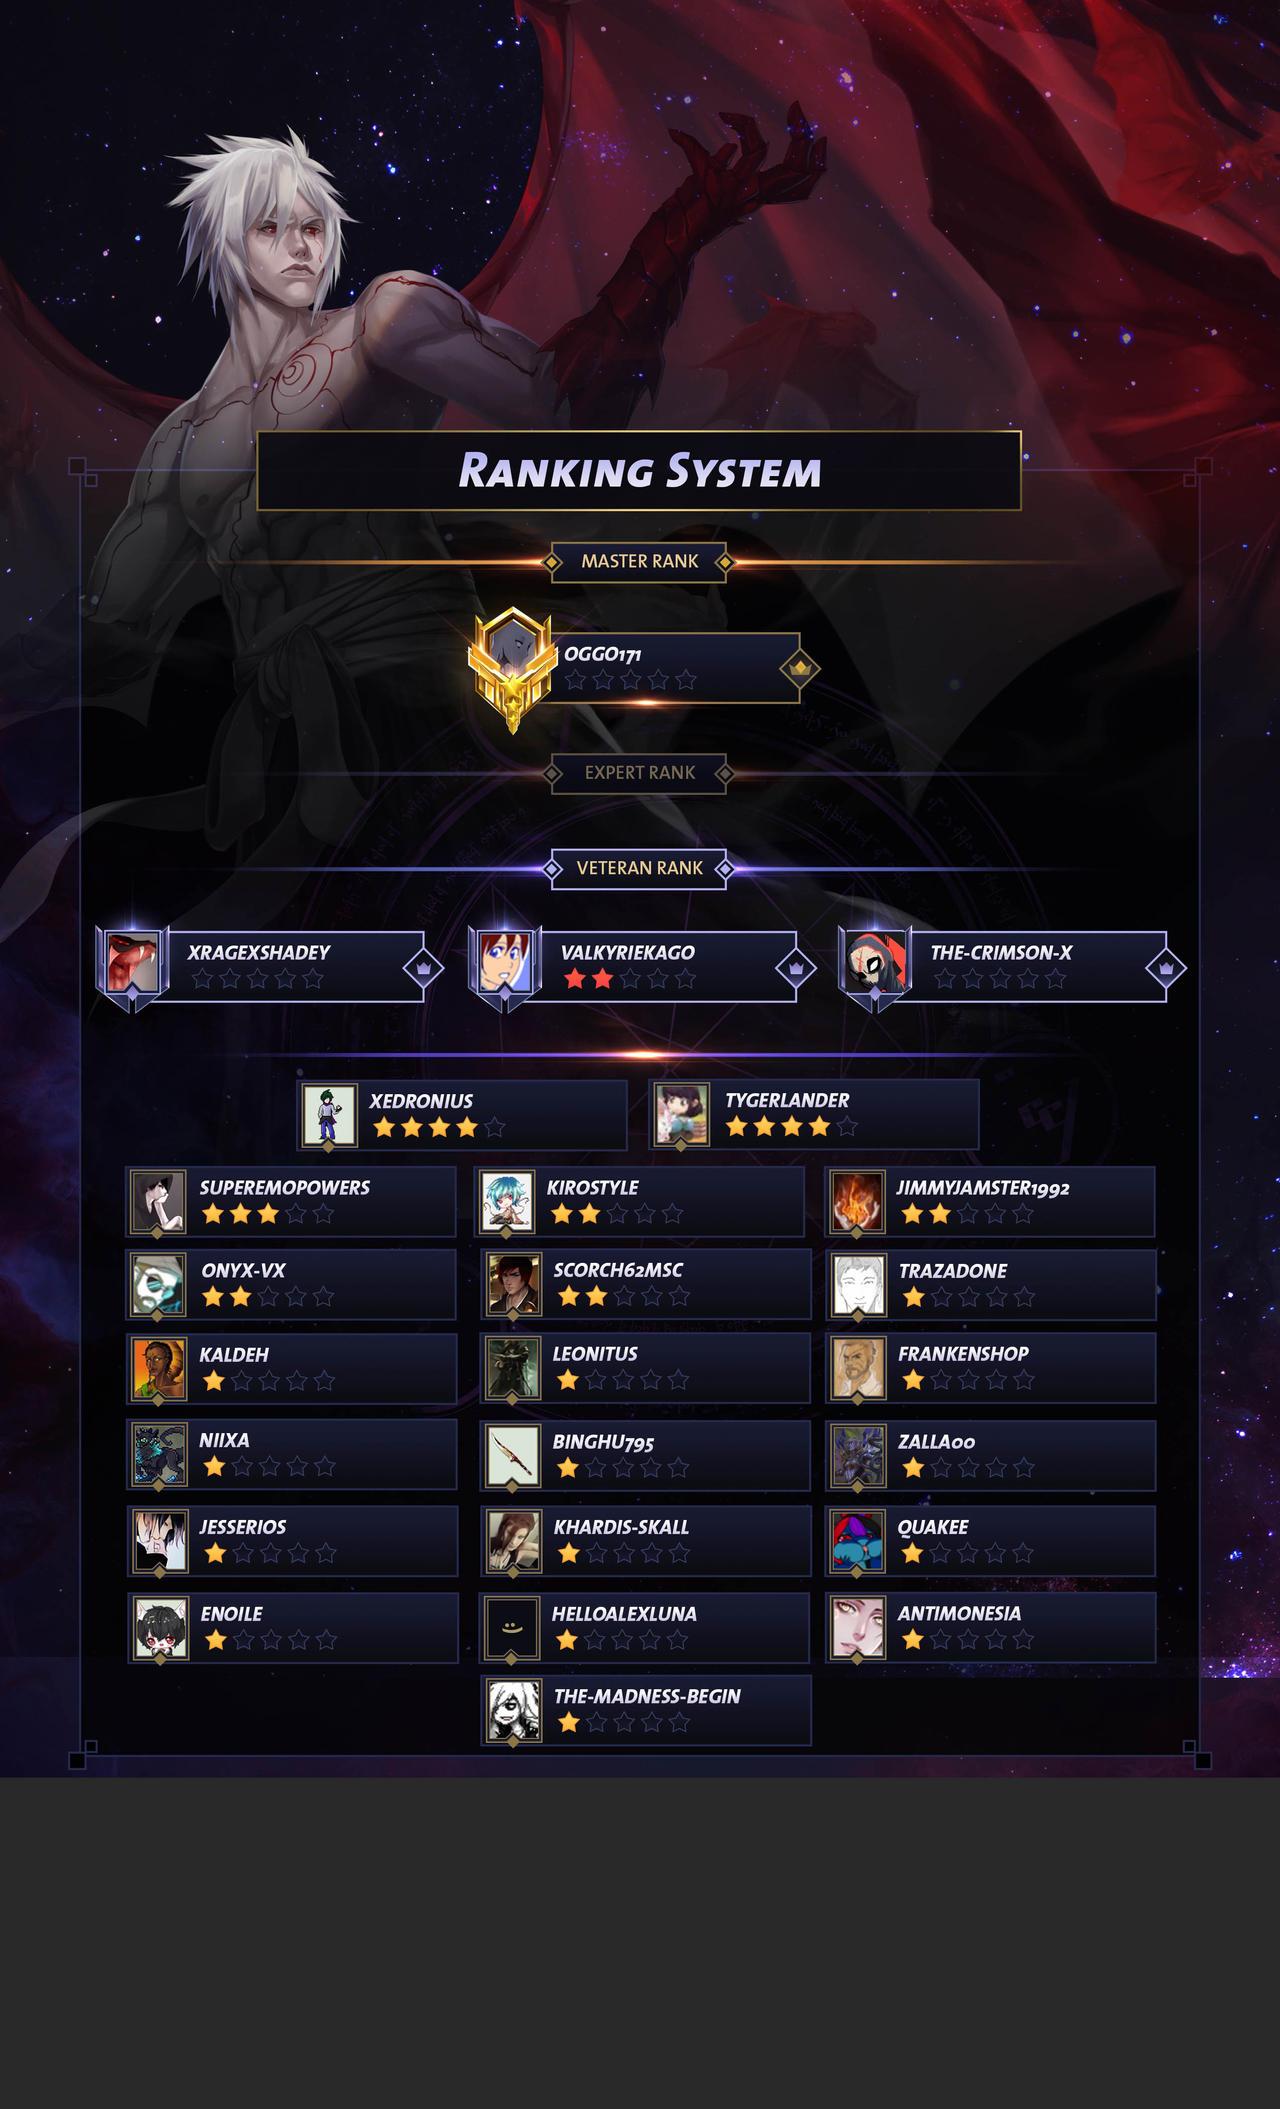 2020-Ranking System-13